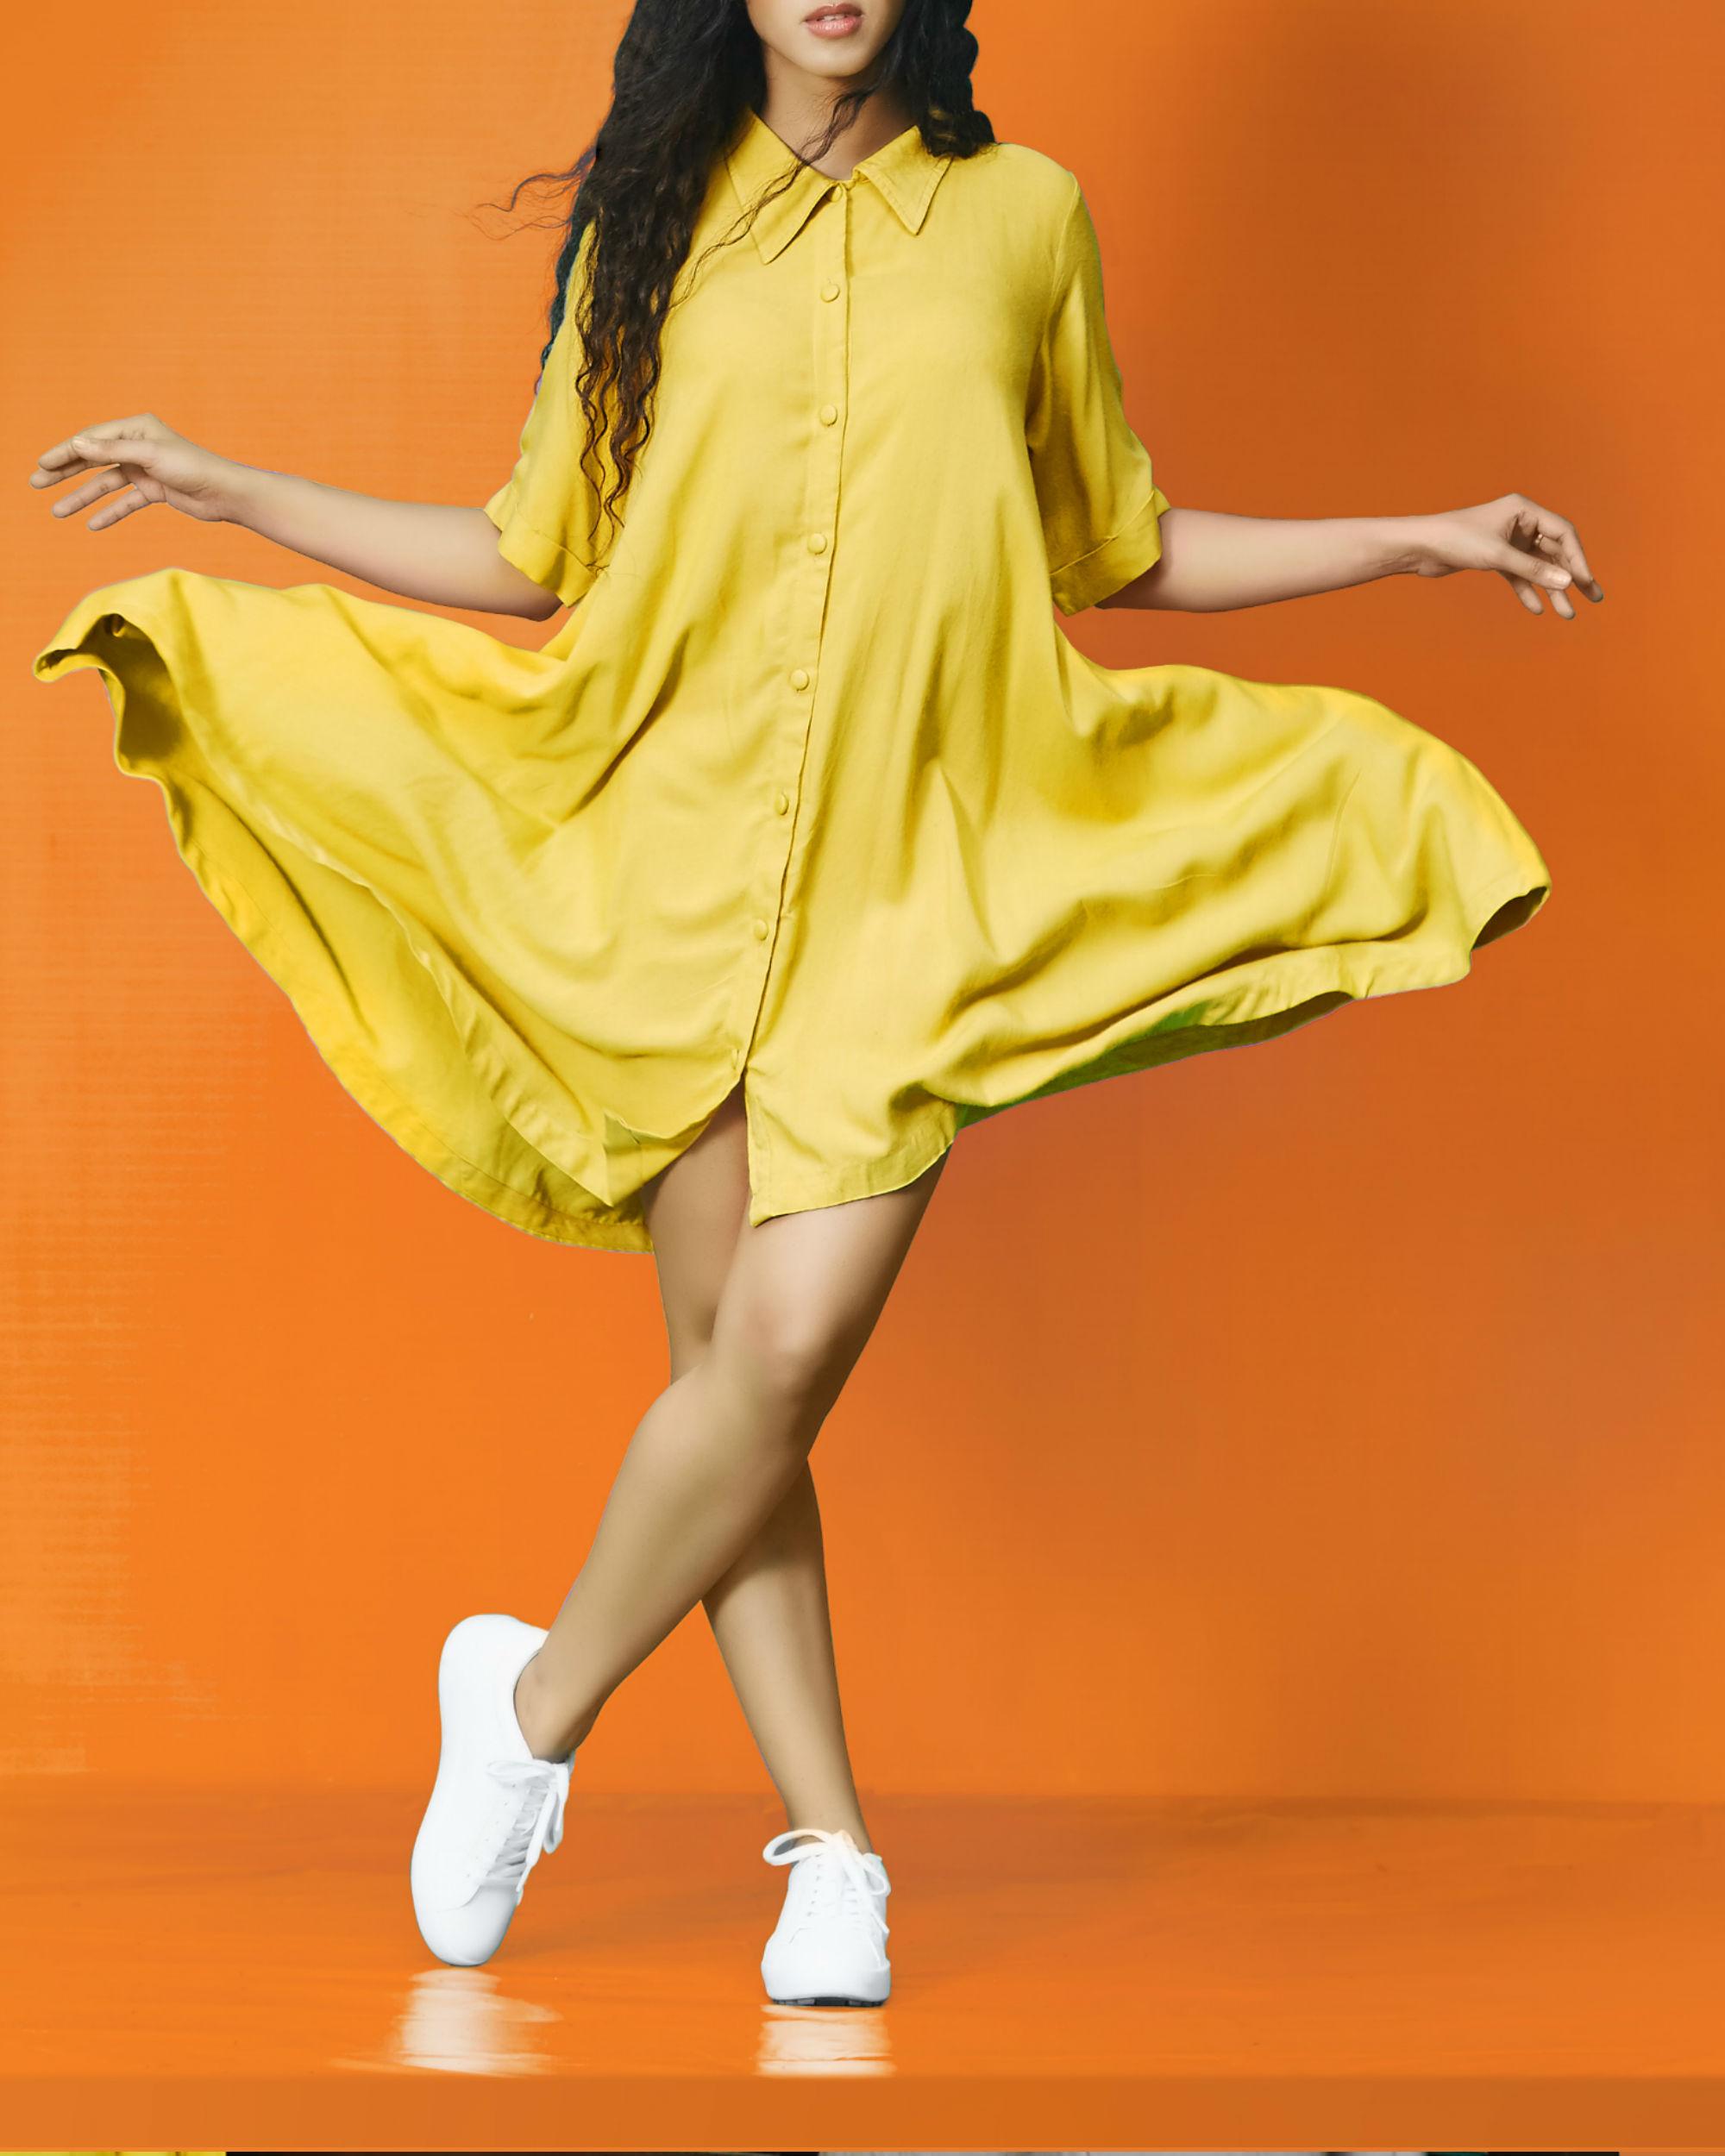 Upsilon dress